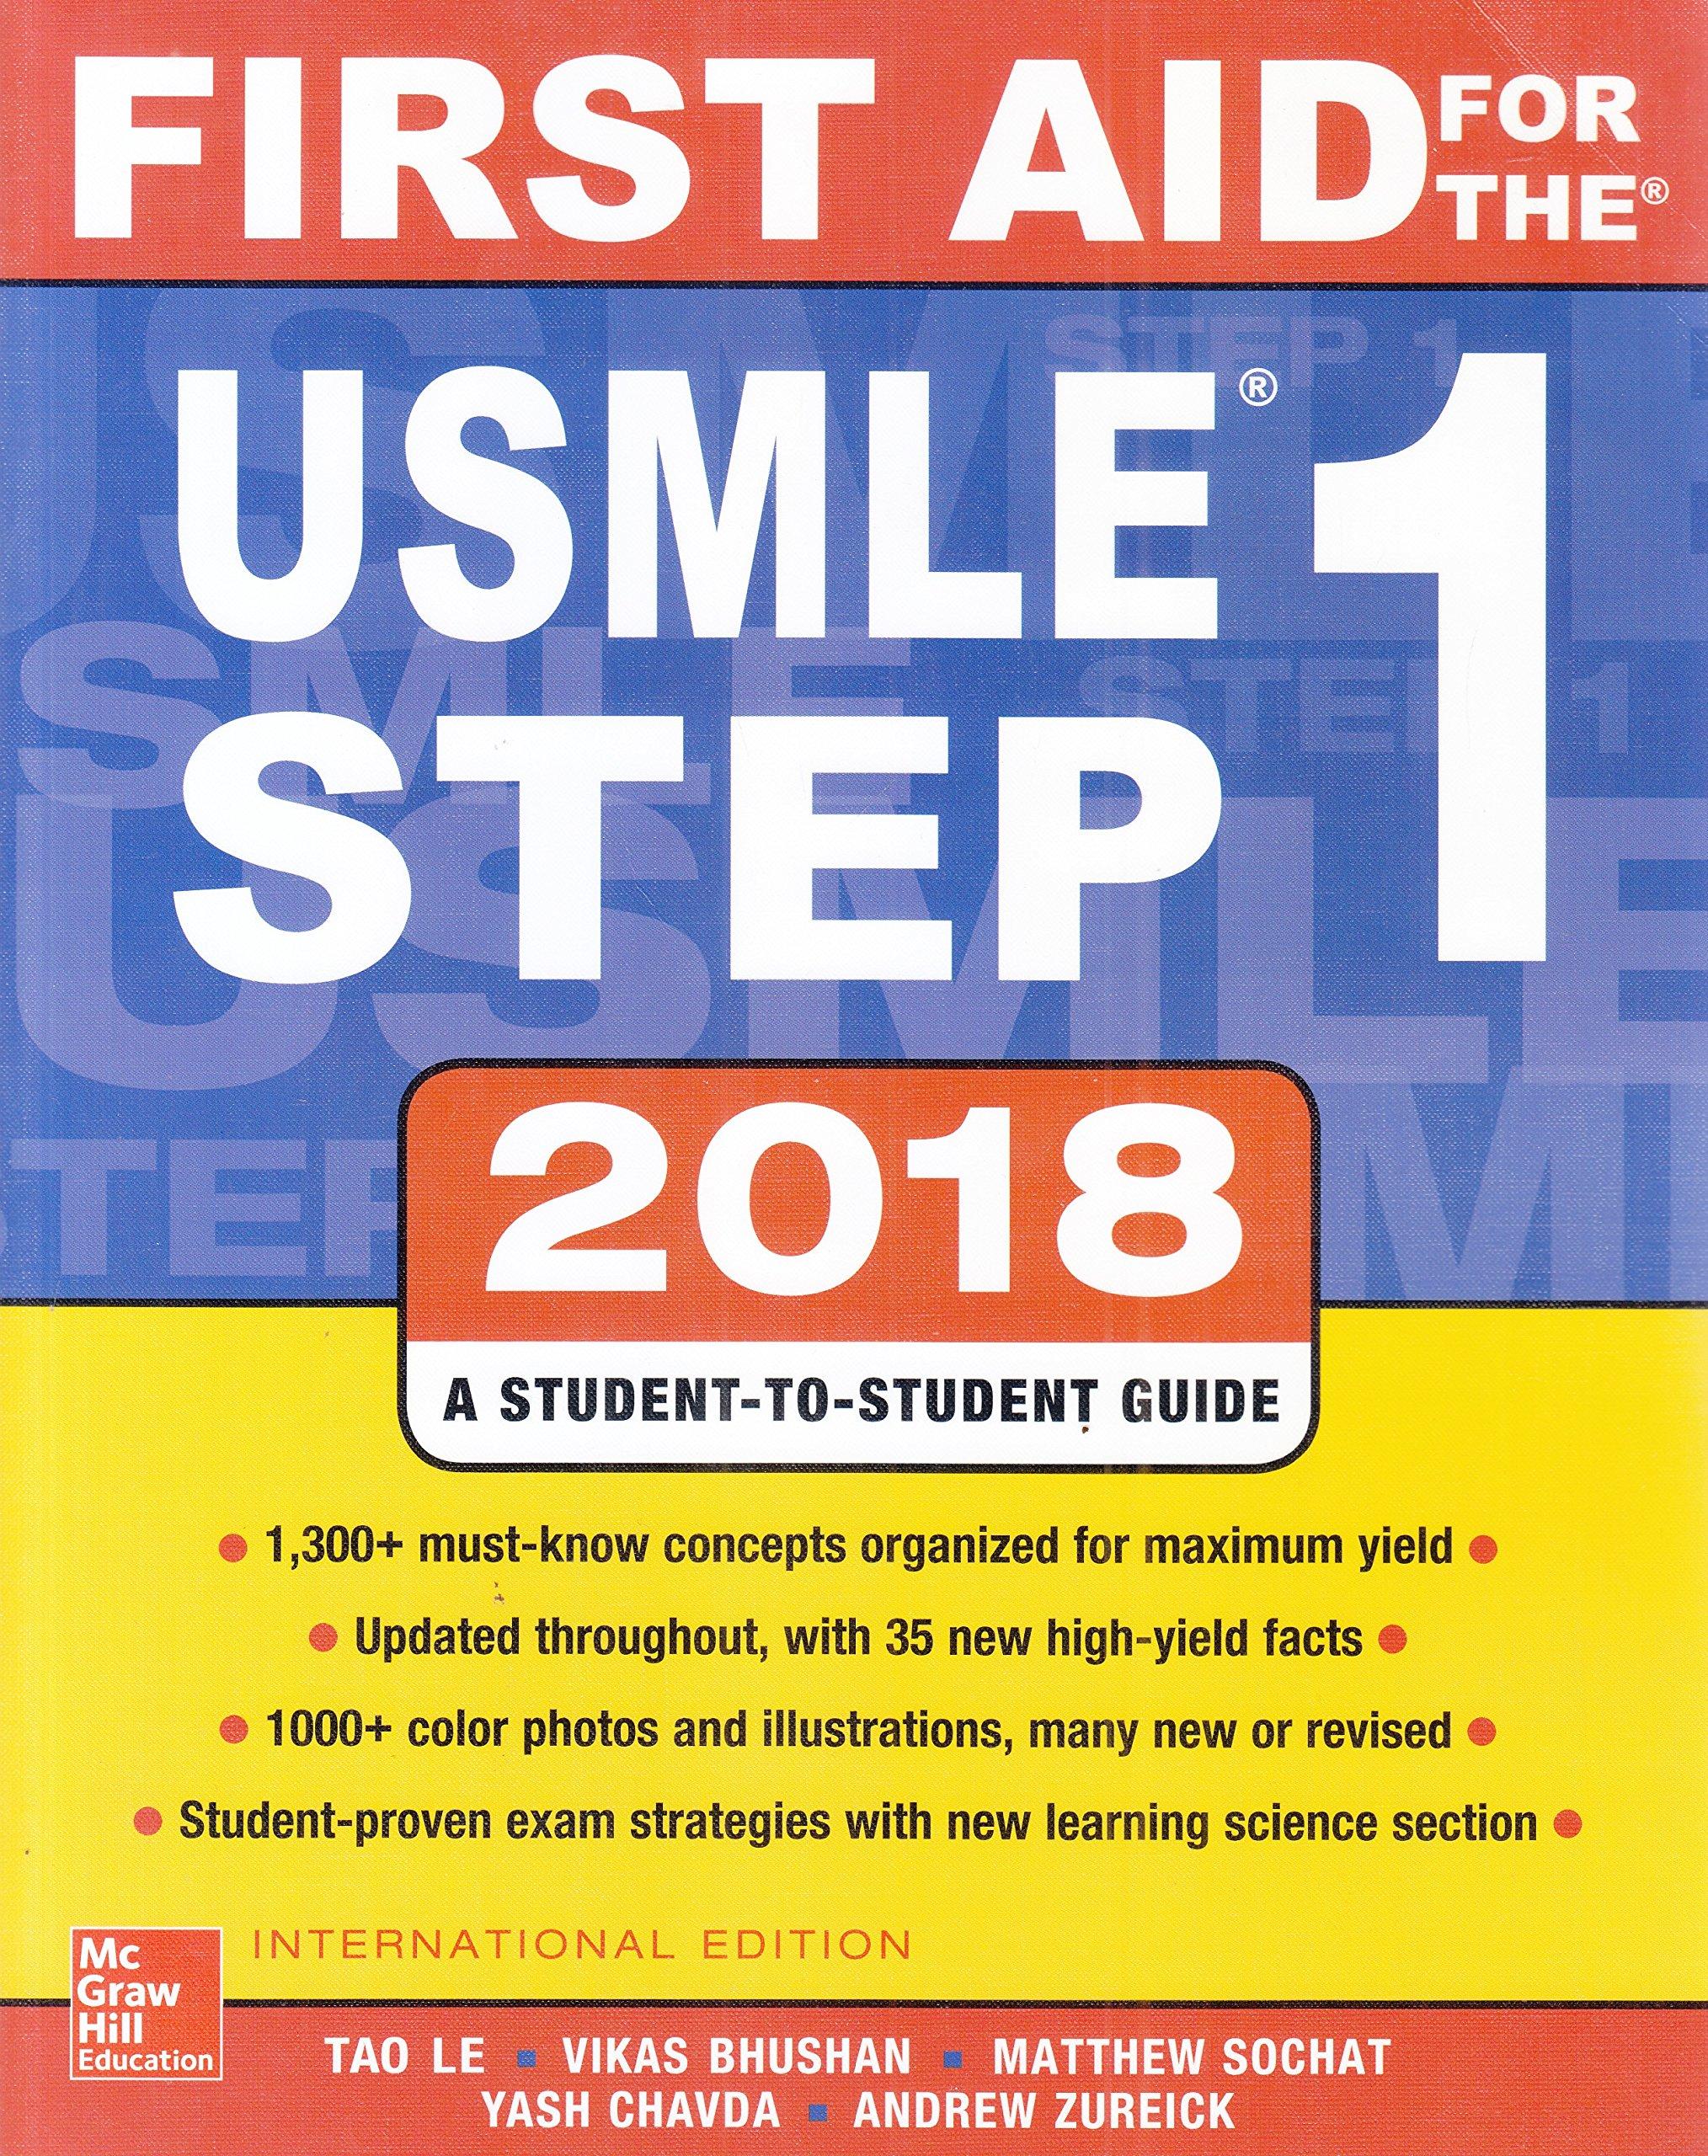 First Aid for the USMLE Step 1 2018 (28th Ed): Tao Le, Vikas Bhushan:  9781260288155: Amazon.com: Books